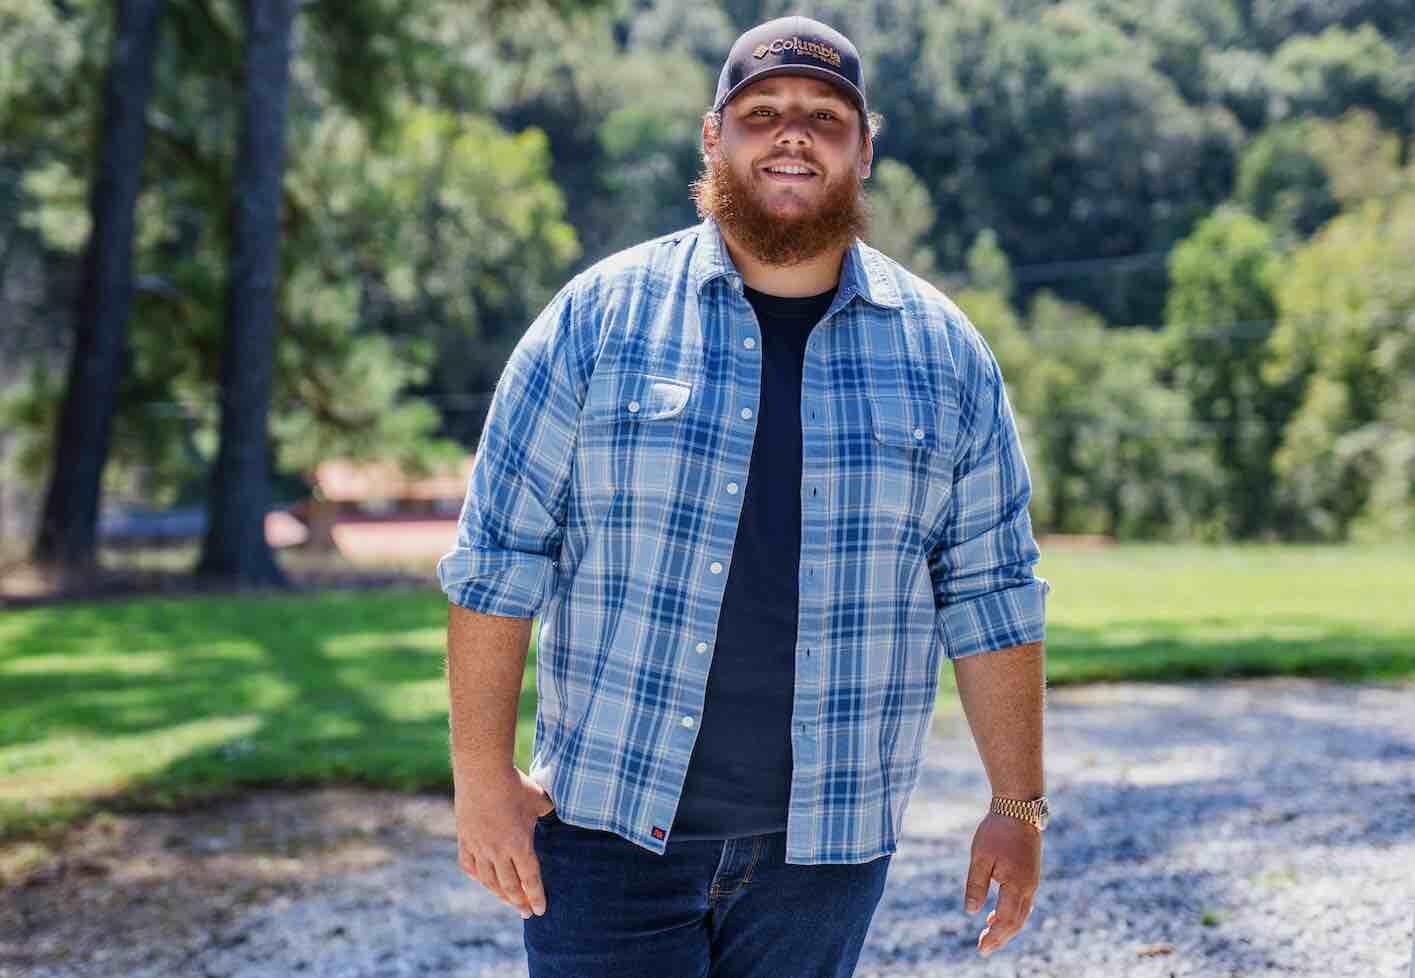 Luke Combs Beer Never Broke My Heart: Luke Combs Radio: Listen To Free Music & Get The Latest